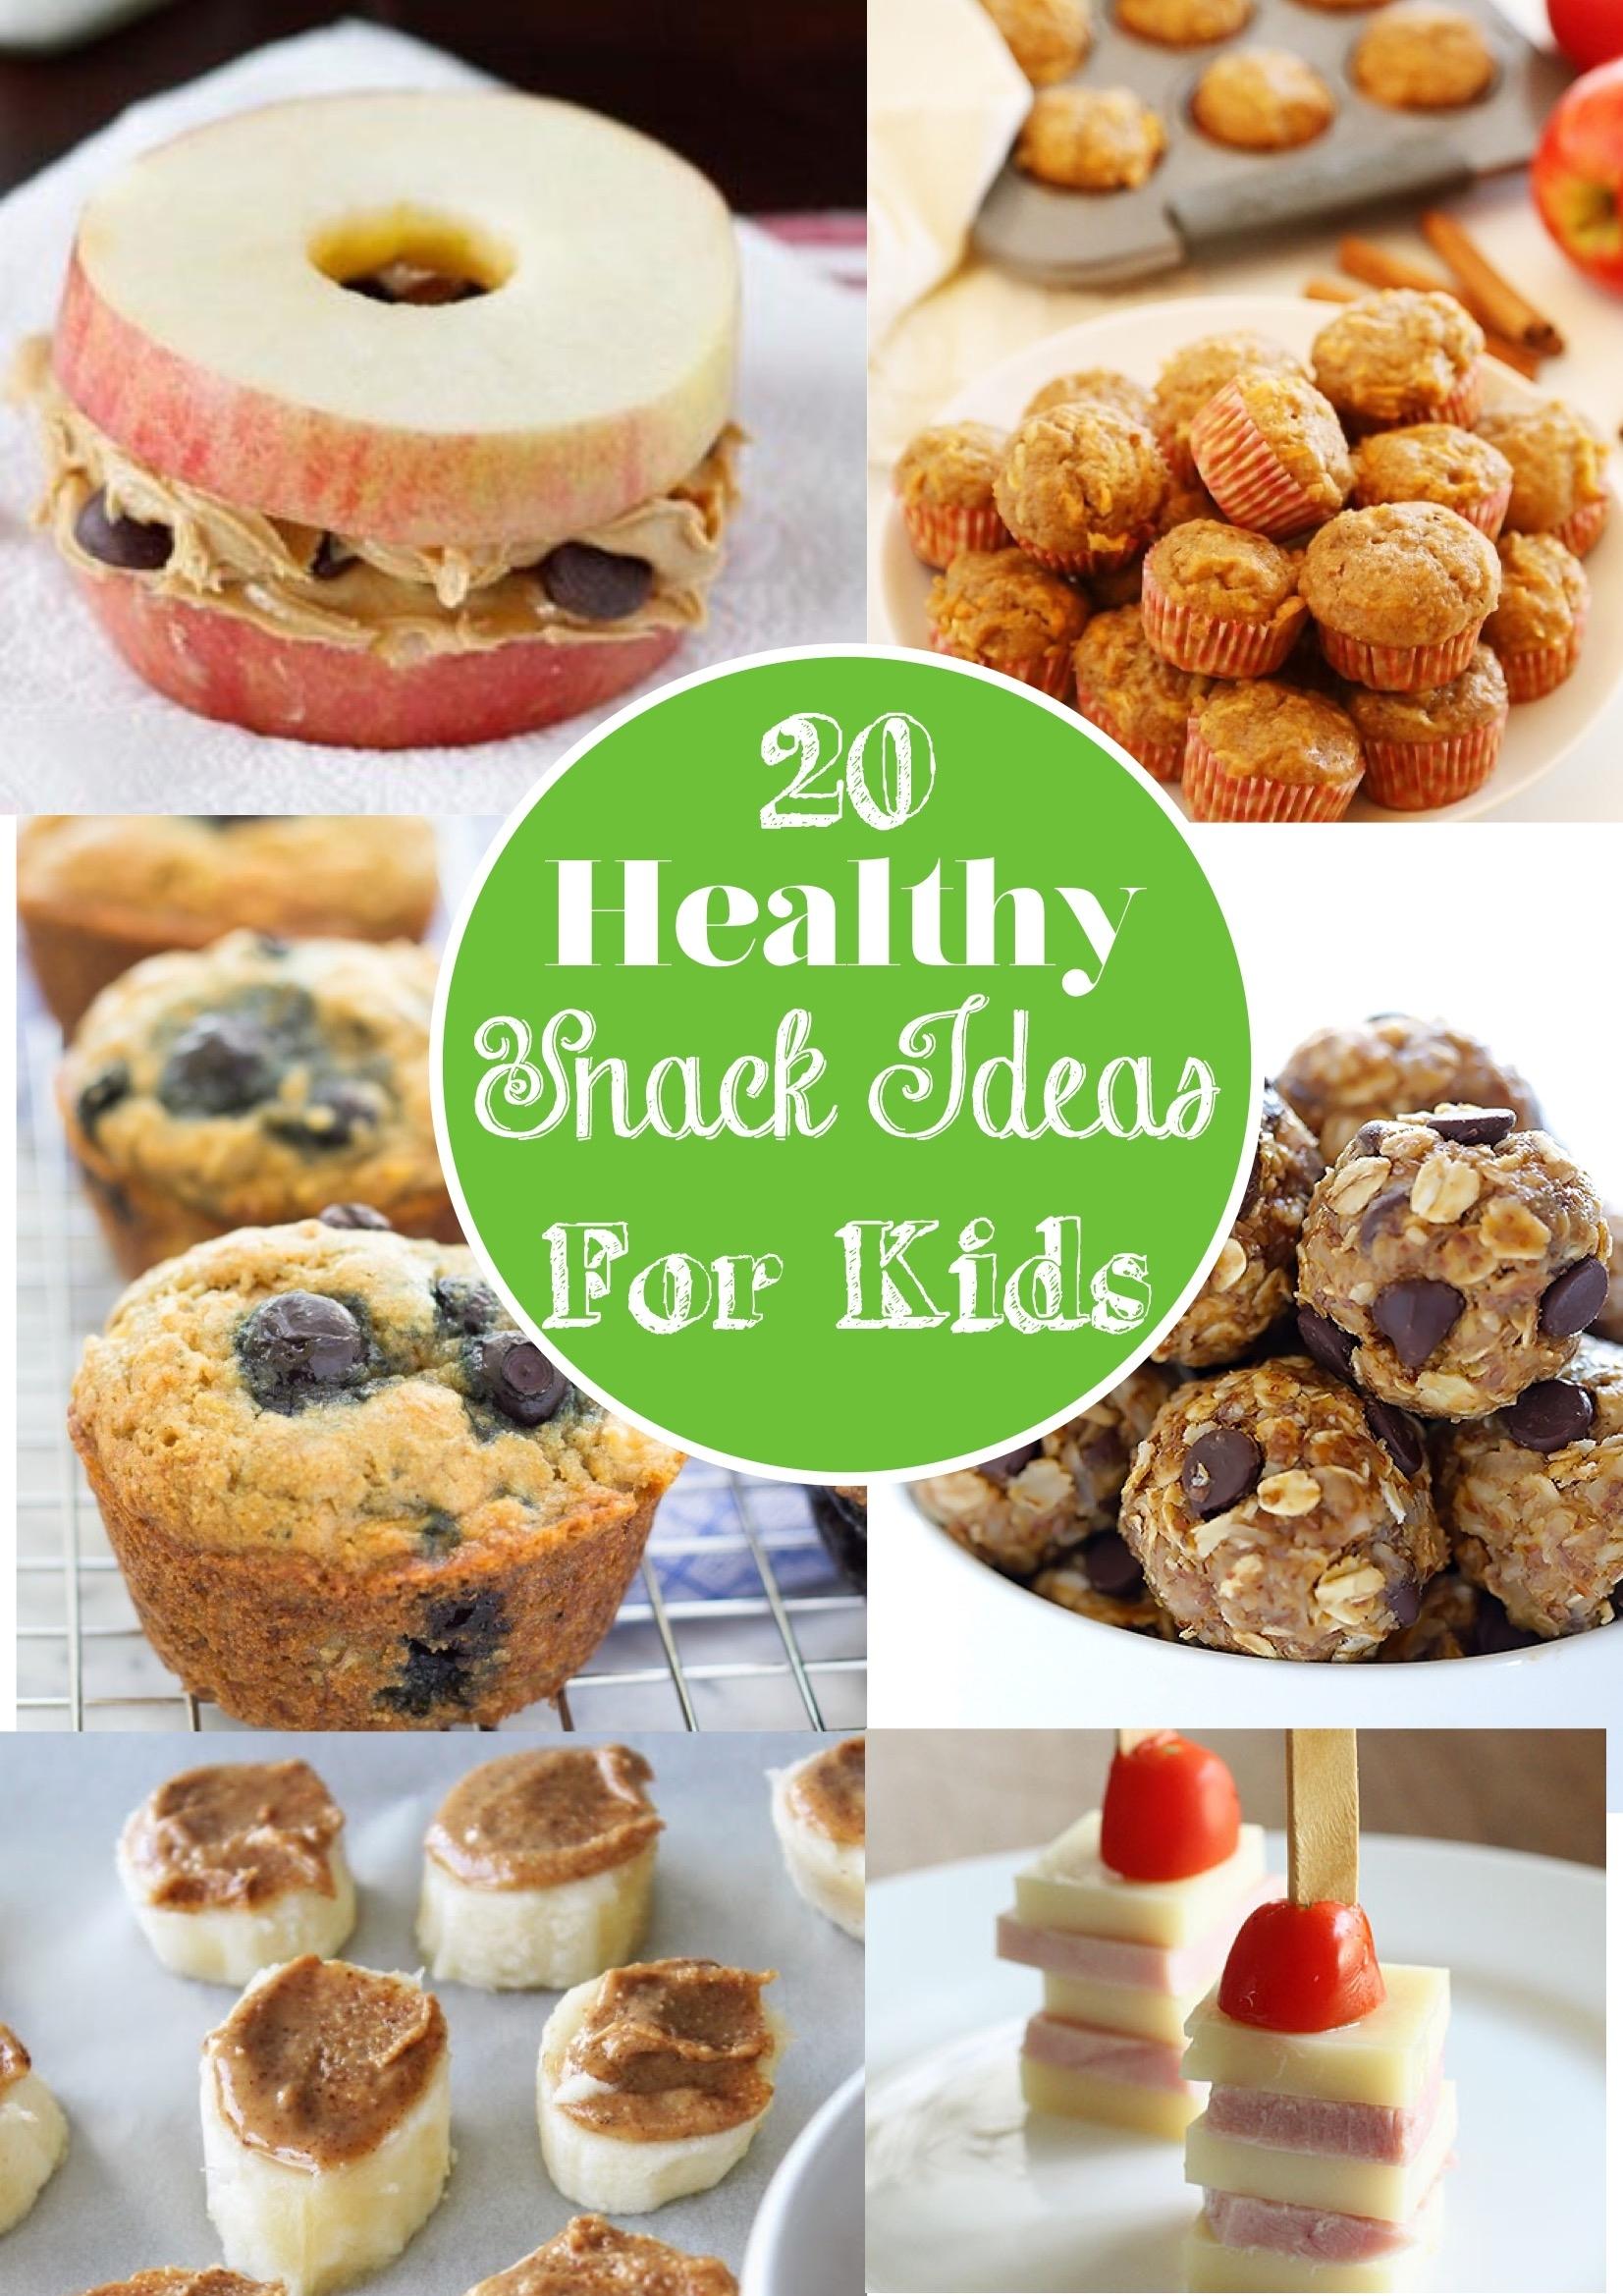 10 Fantastic School Snack Ideas For Kids %name 2020